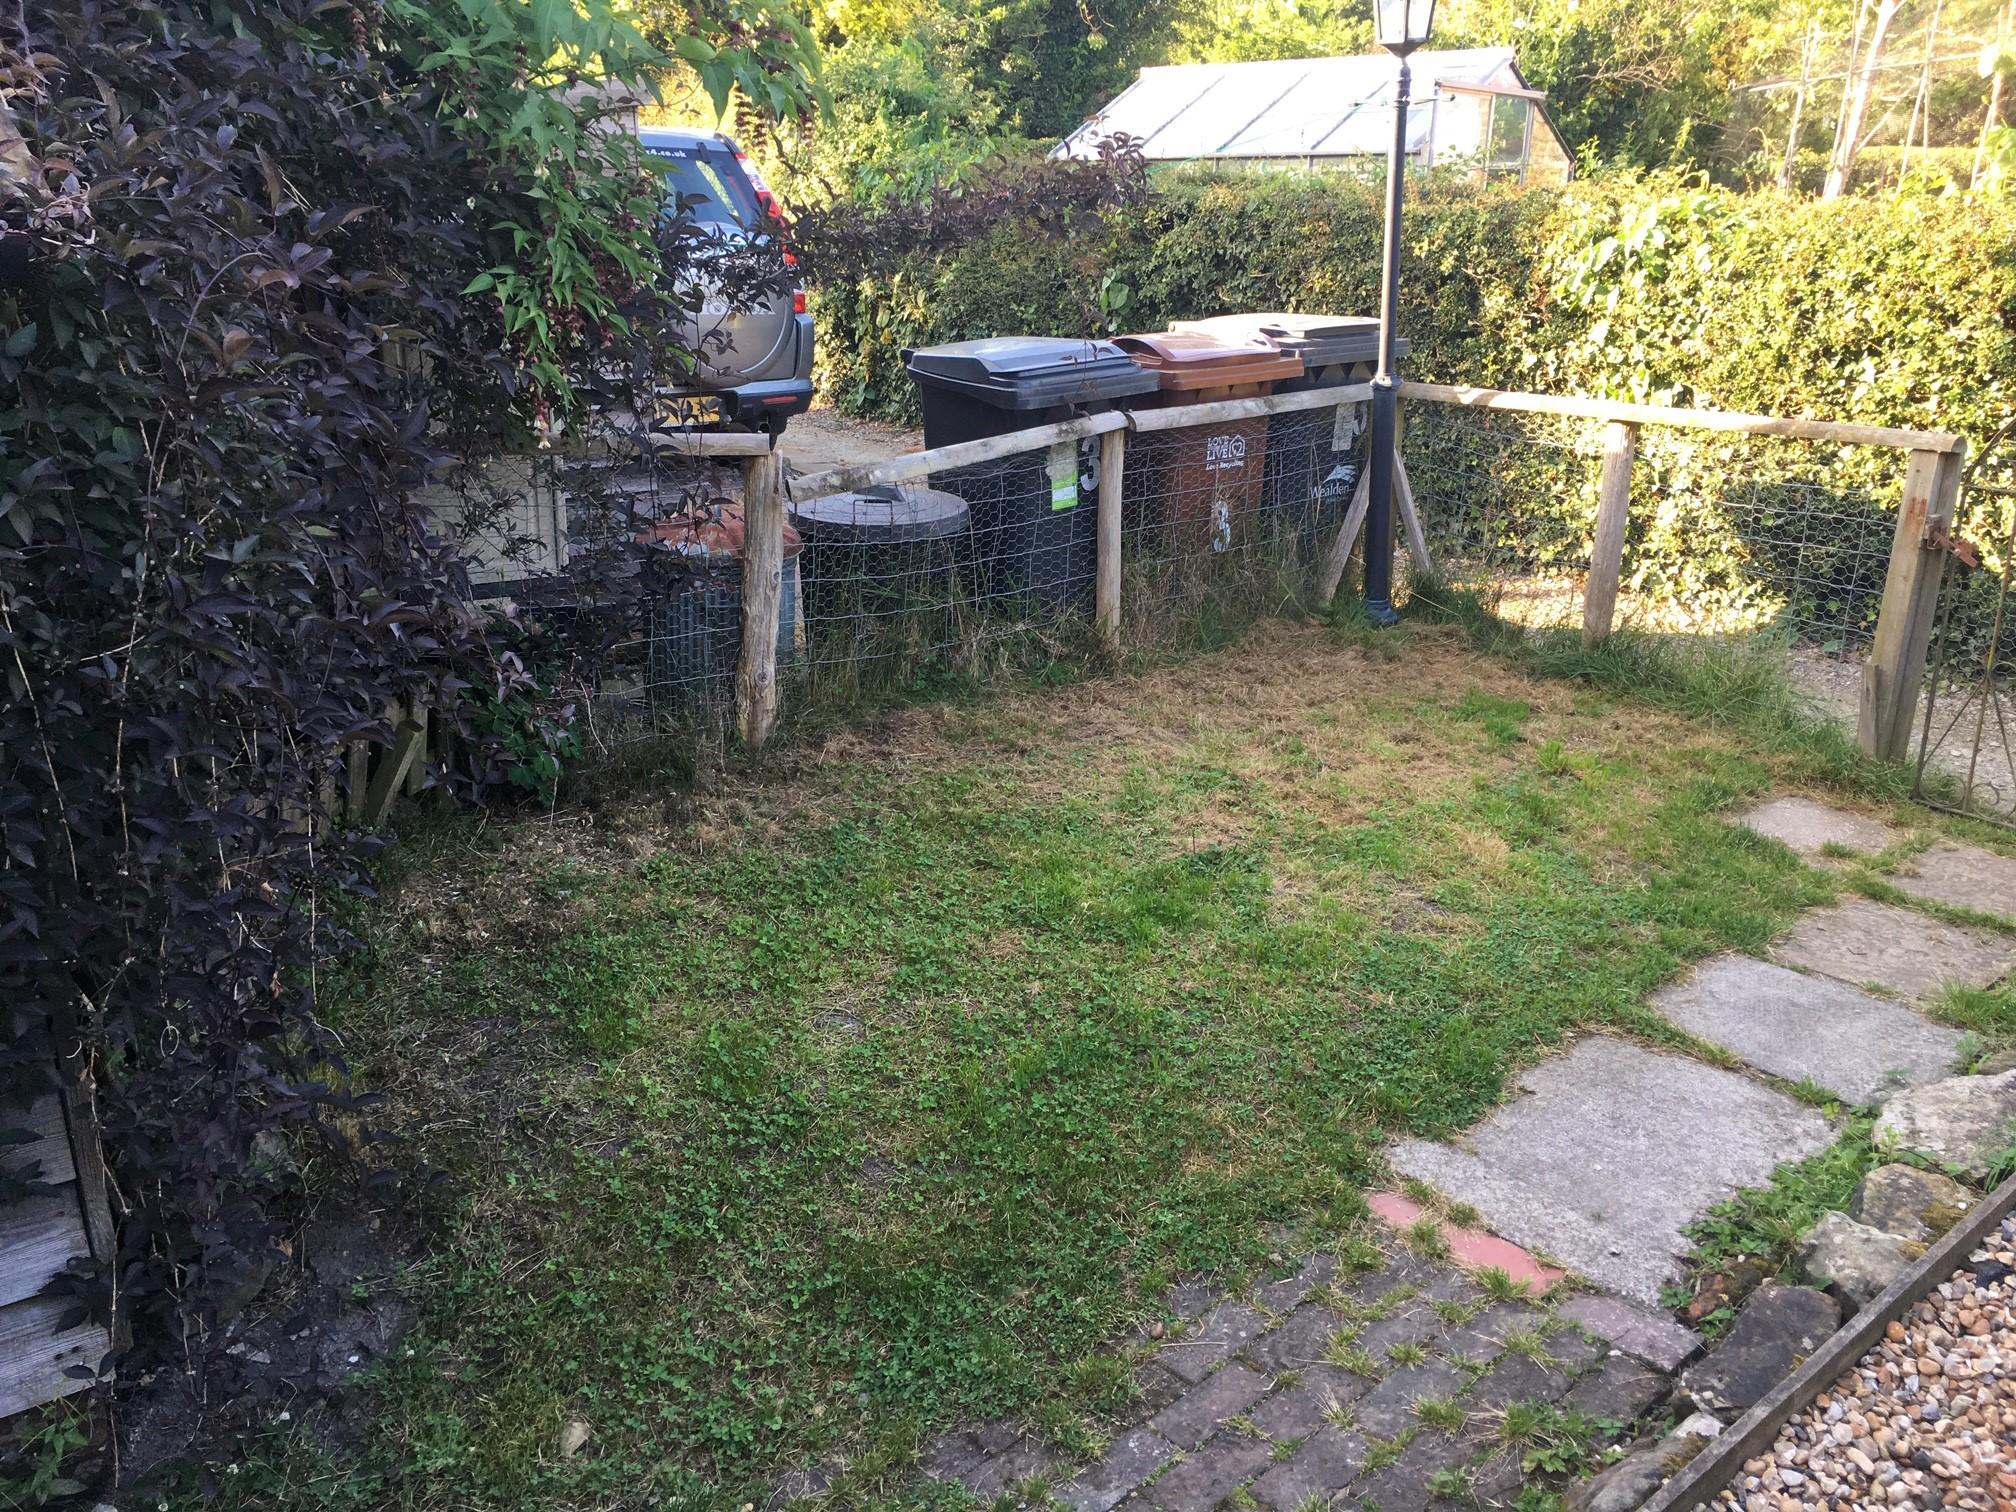 Grassy mound with bins!